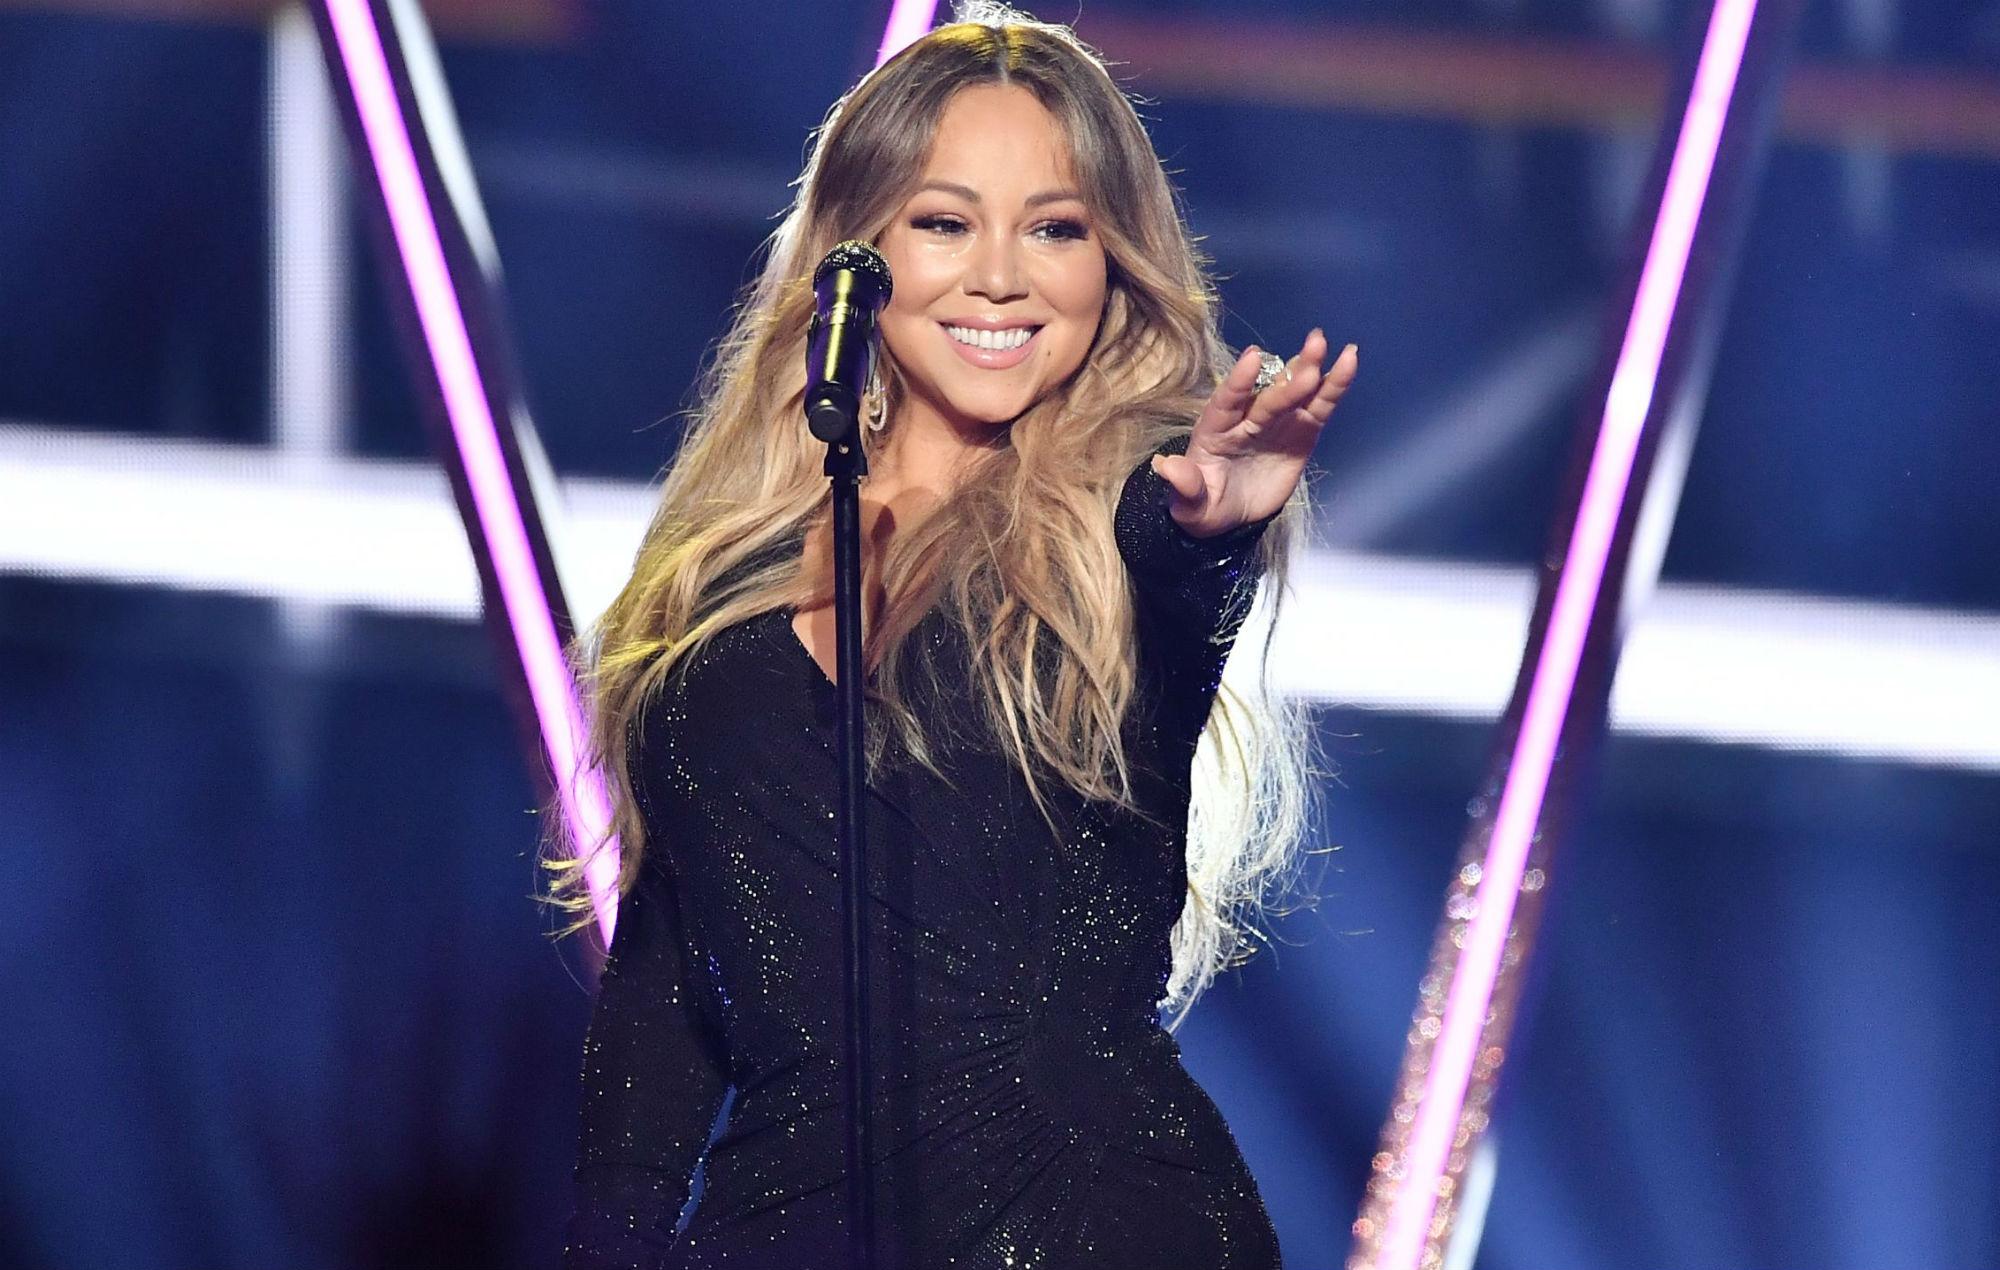 Mariah Carey to release memoir 'The Meaning of Mariah Carey', Shop Ticket Snatchers